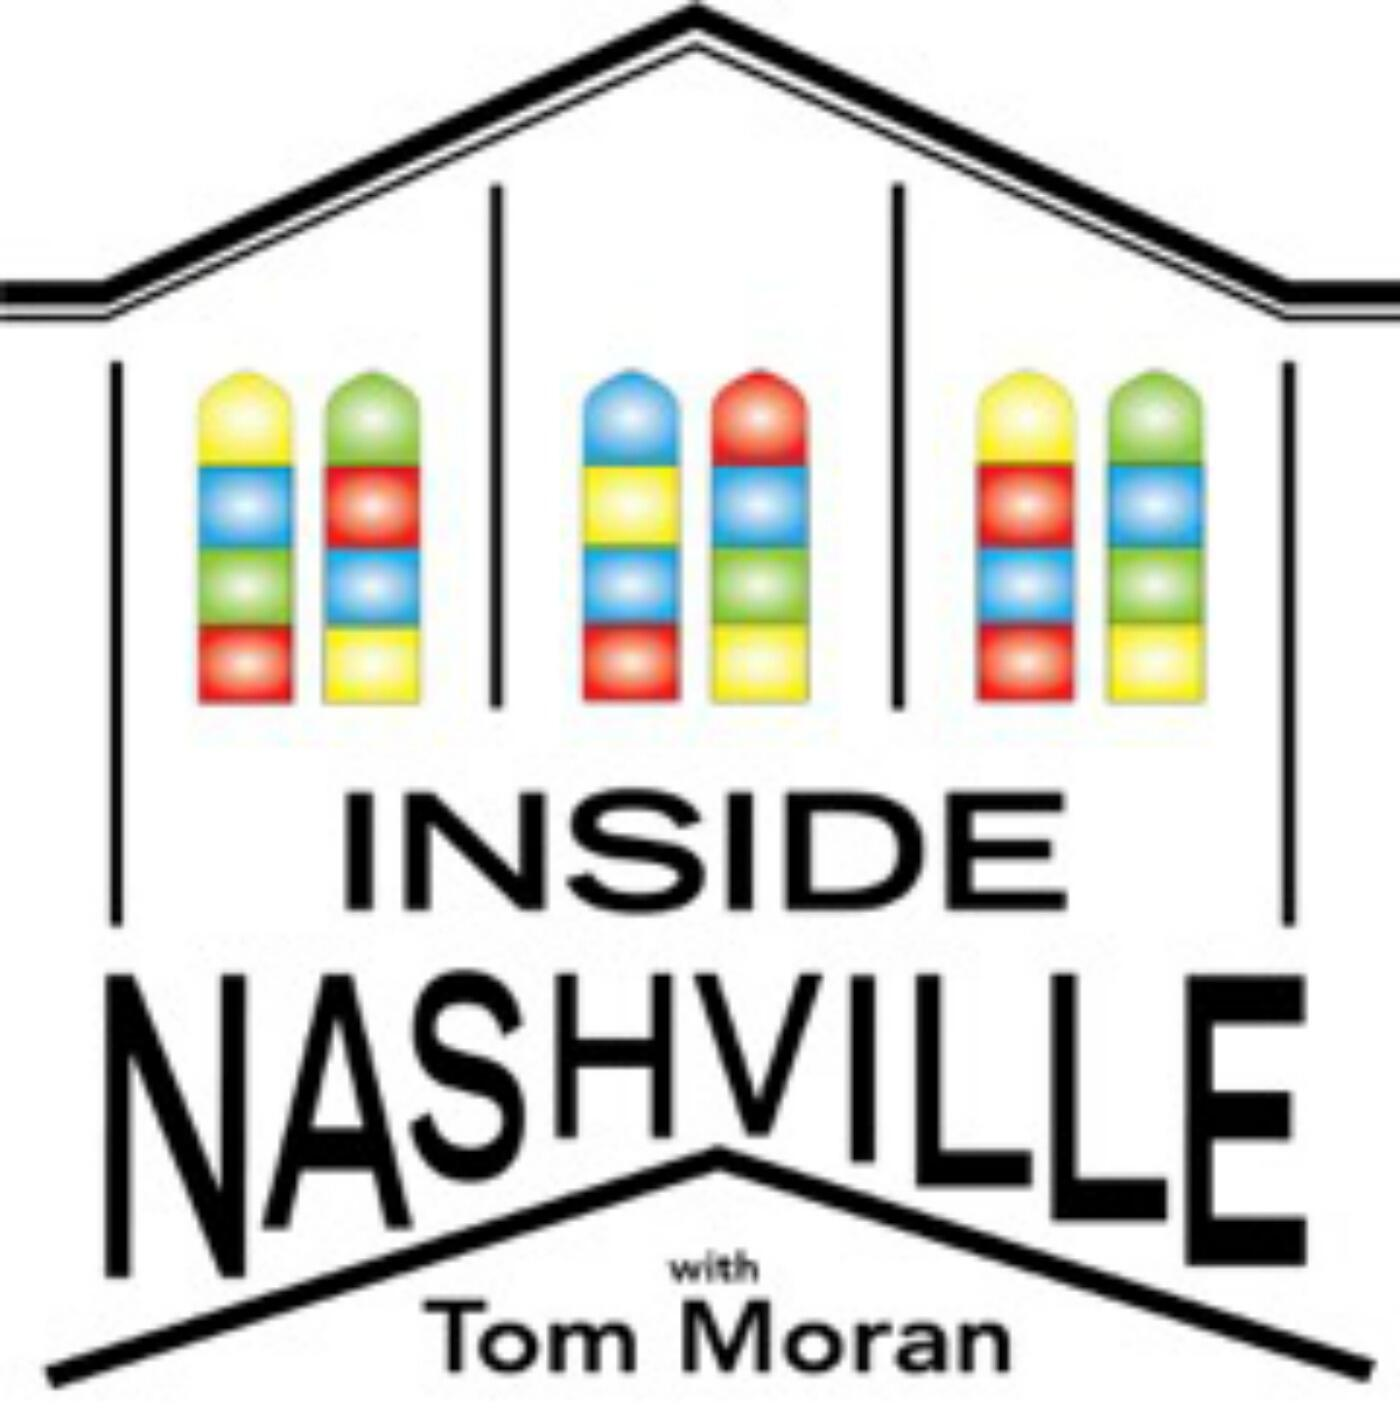 Episode 59 A Conversation With Legendary Nashville Producer Mark Wright Inside Nashville With Tom Moran Iheartradio